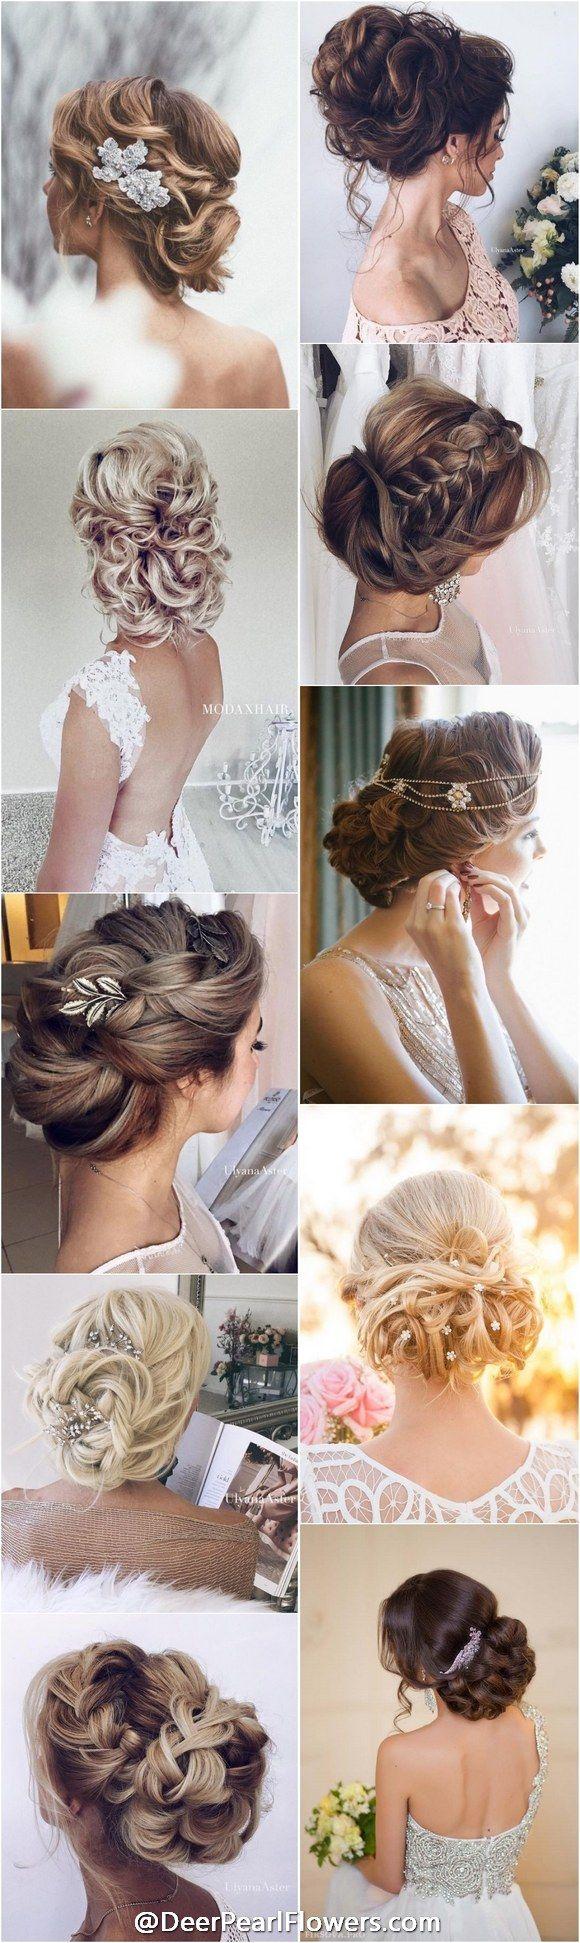 chic wedding hair updos for elegant brides weddings hair style